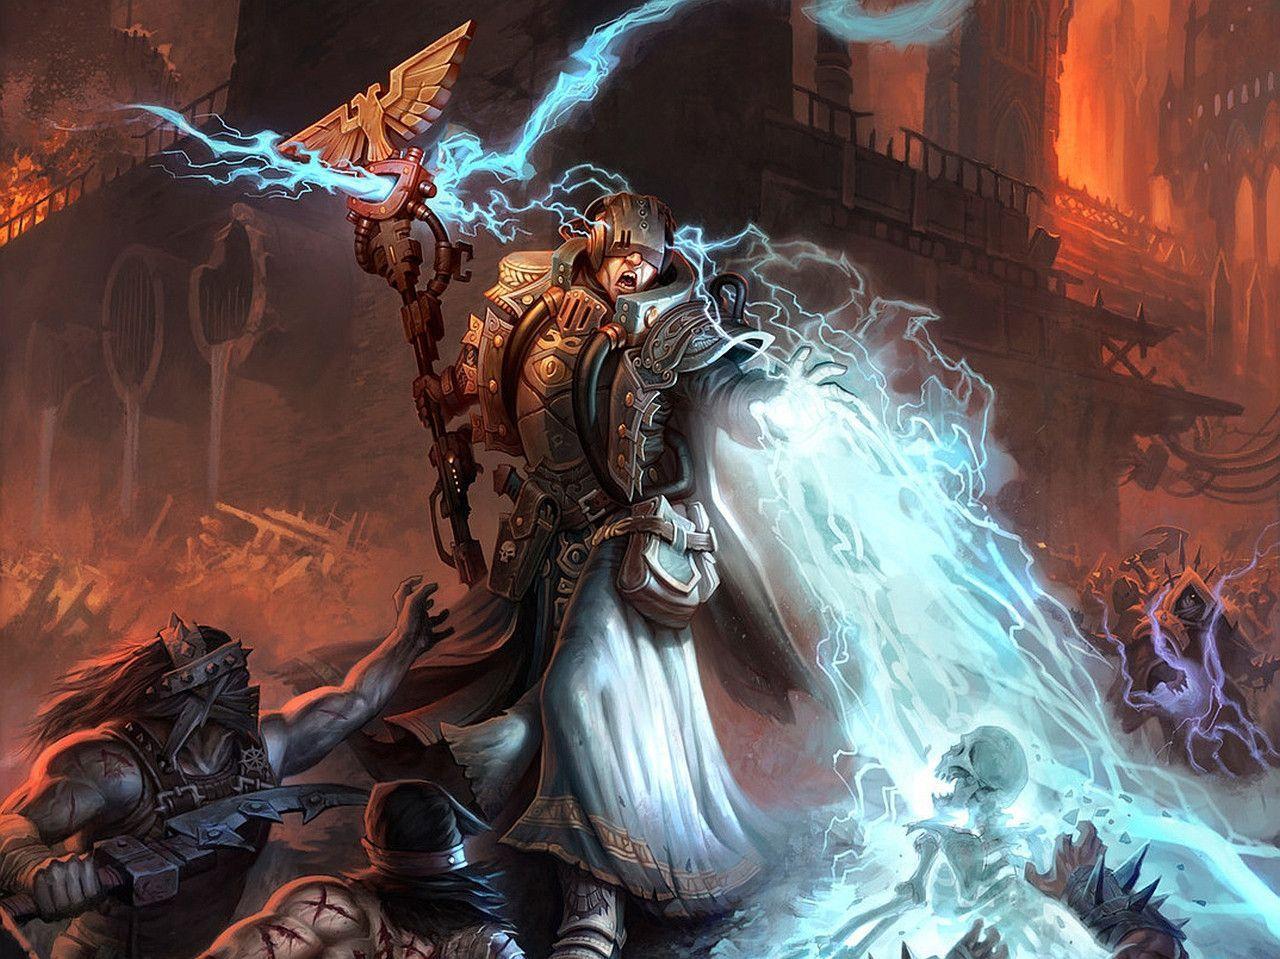 Warhammer 40k Backgrounds - Wallpaper Cave